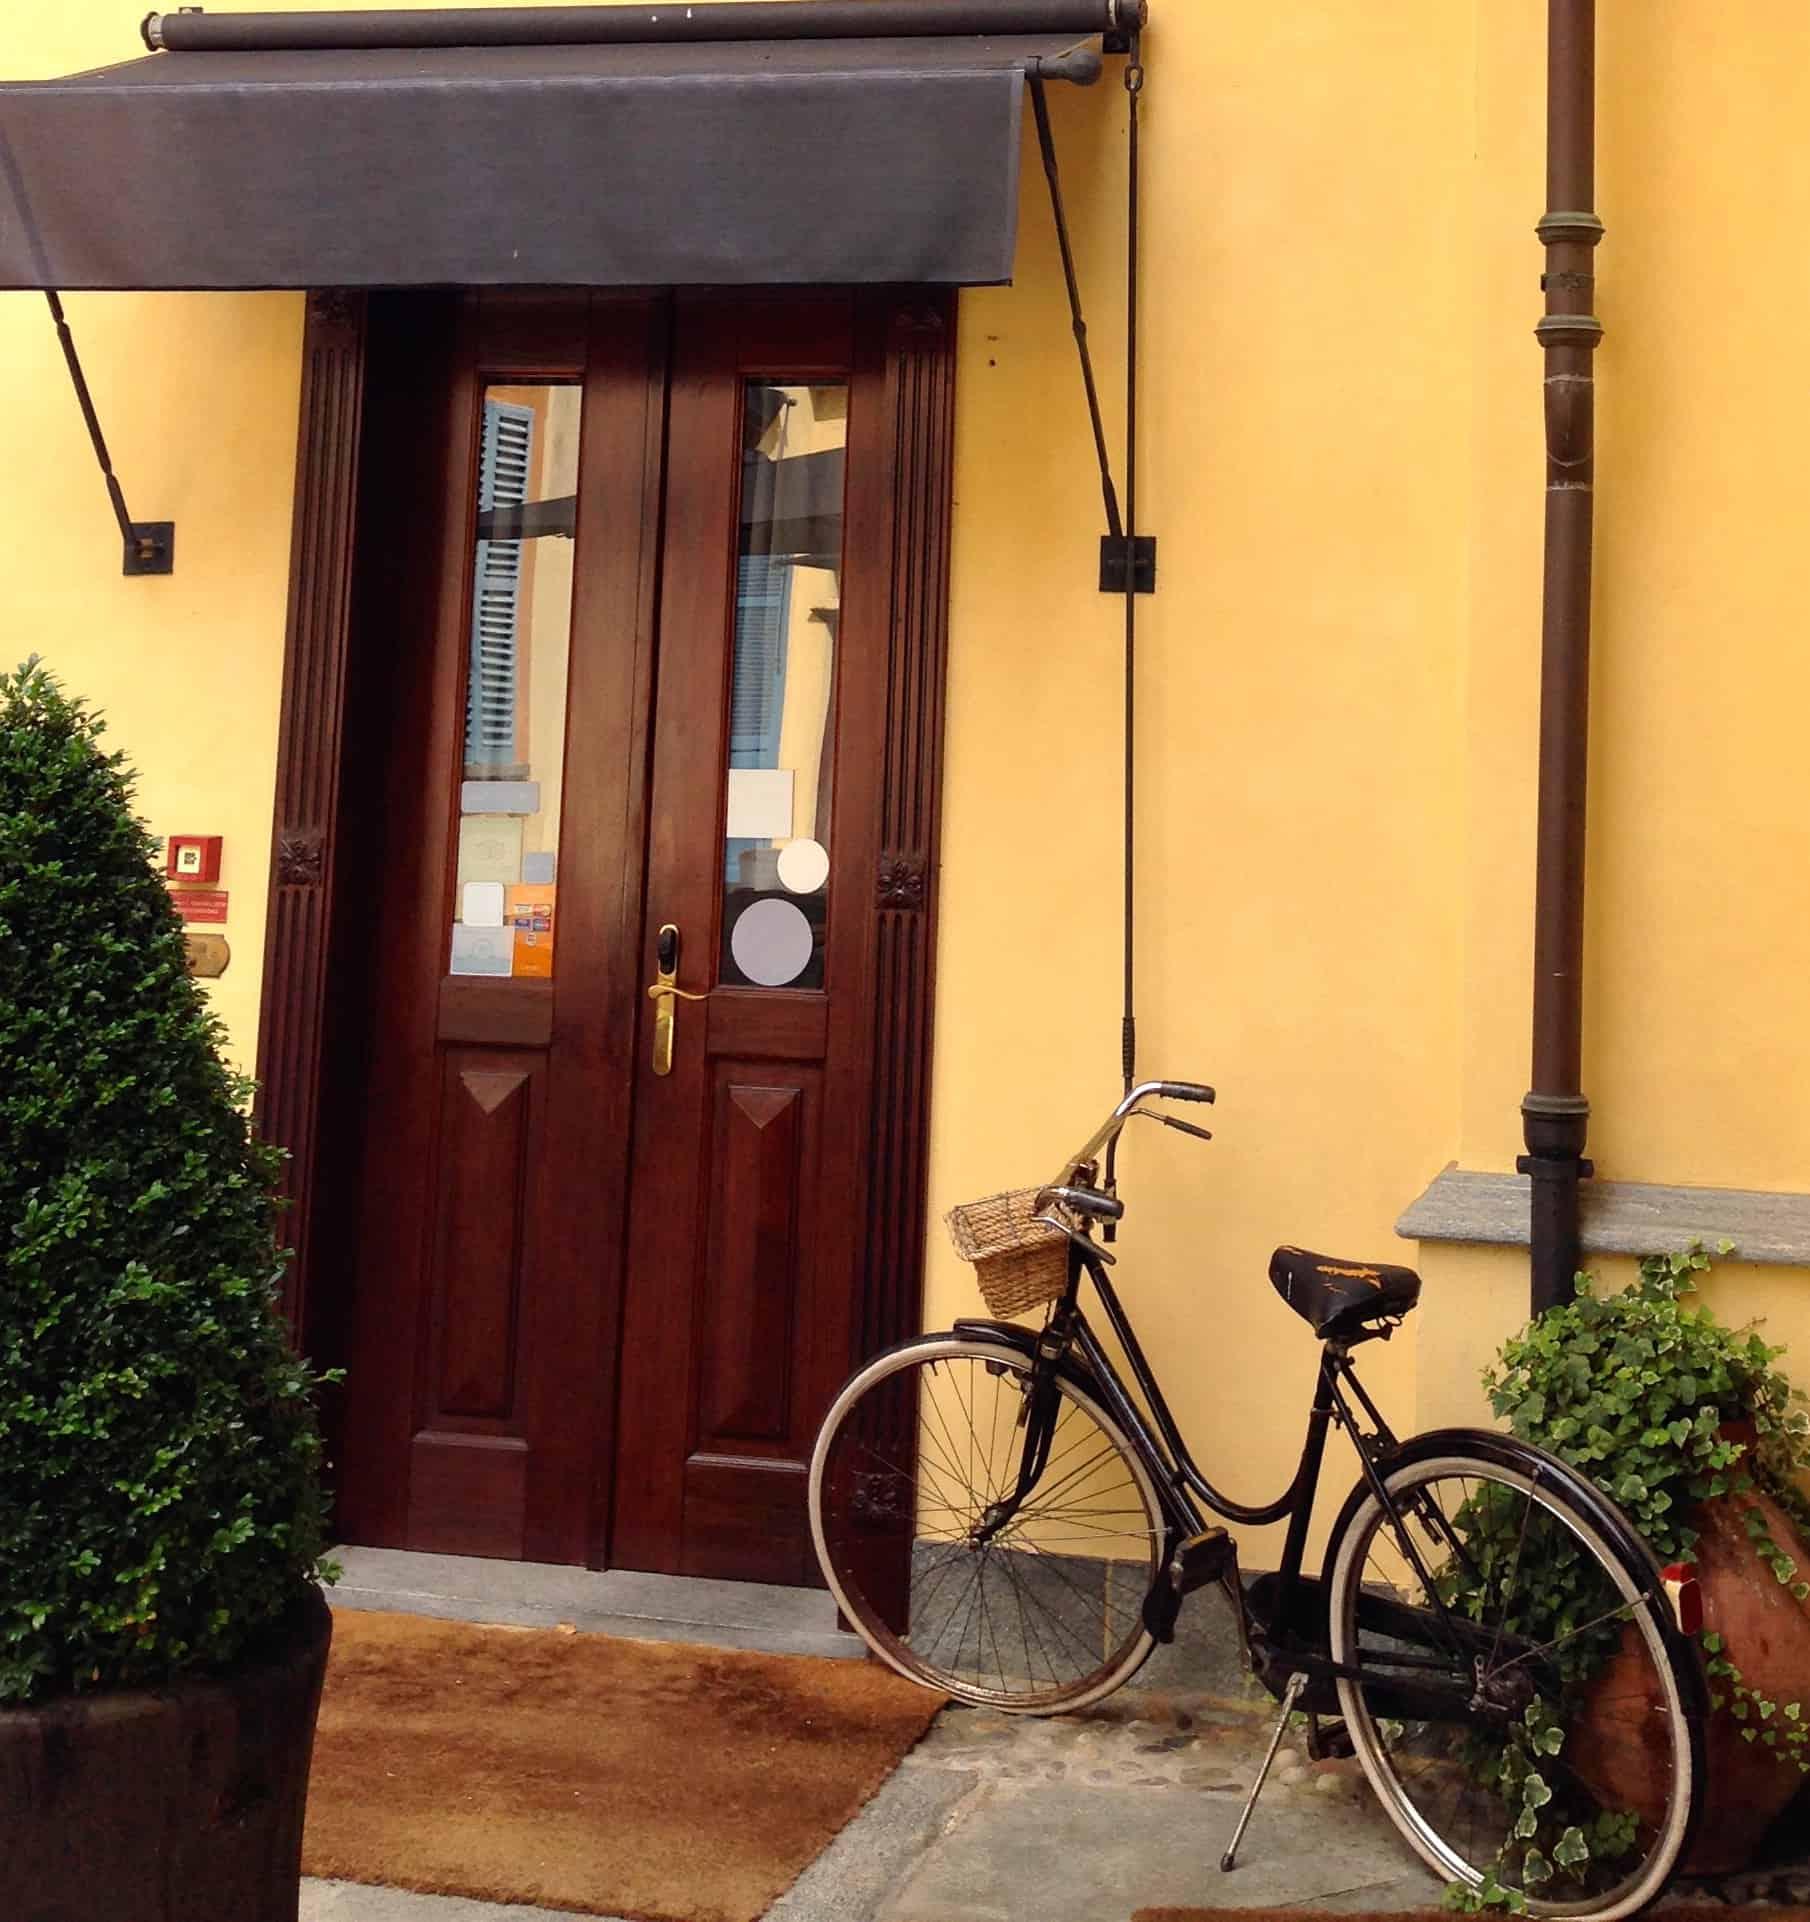 Bike_yellowwall_browndoor